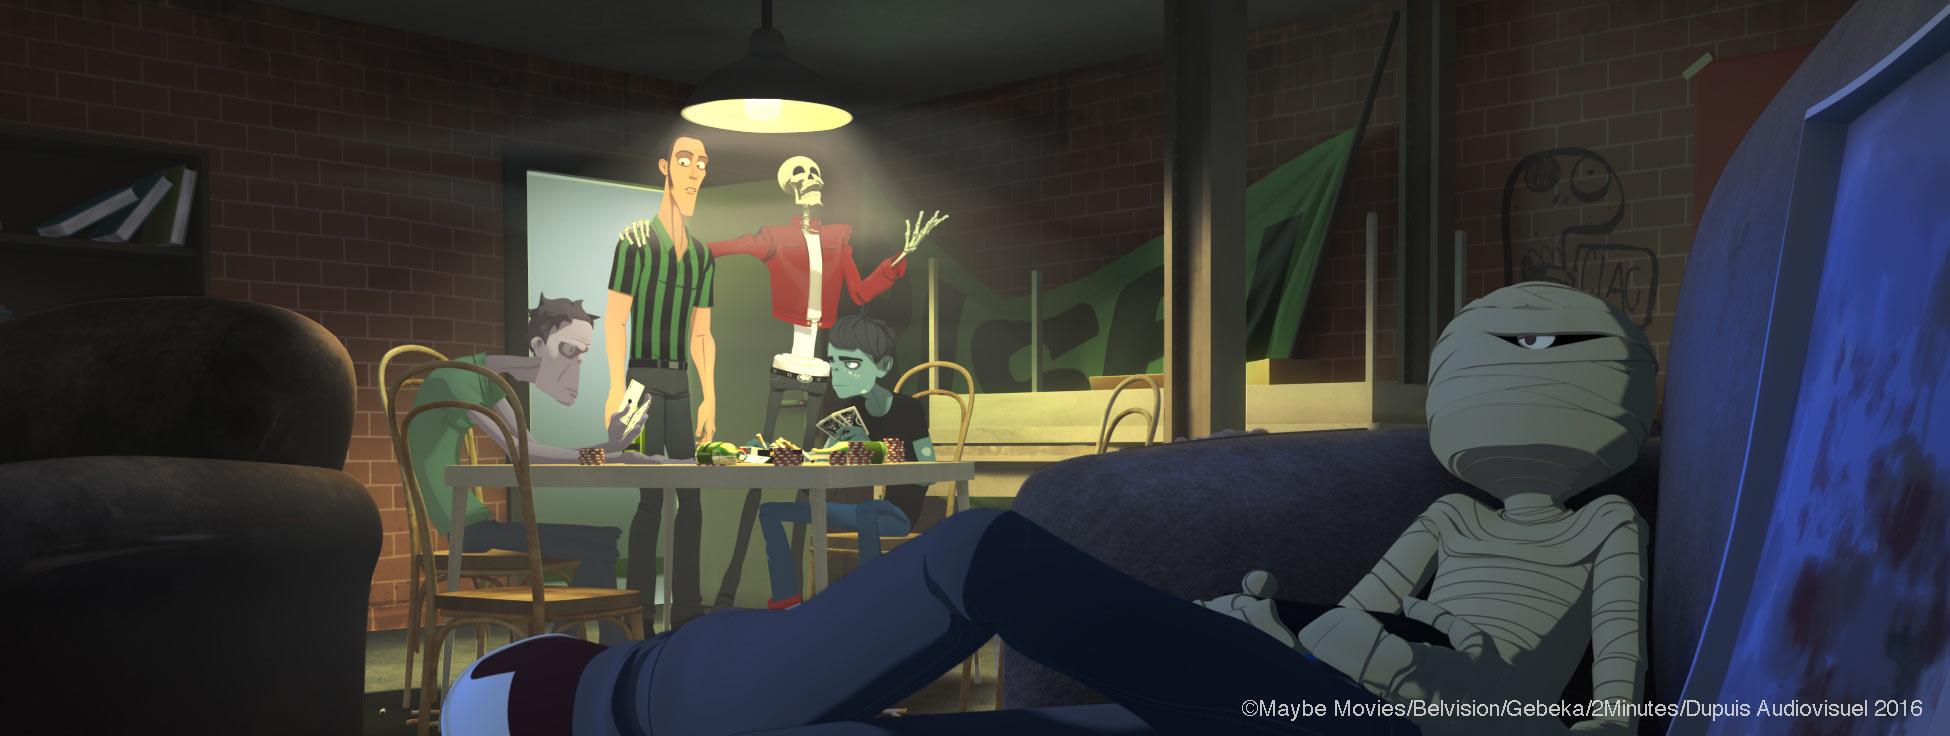 Studio d'animation